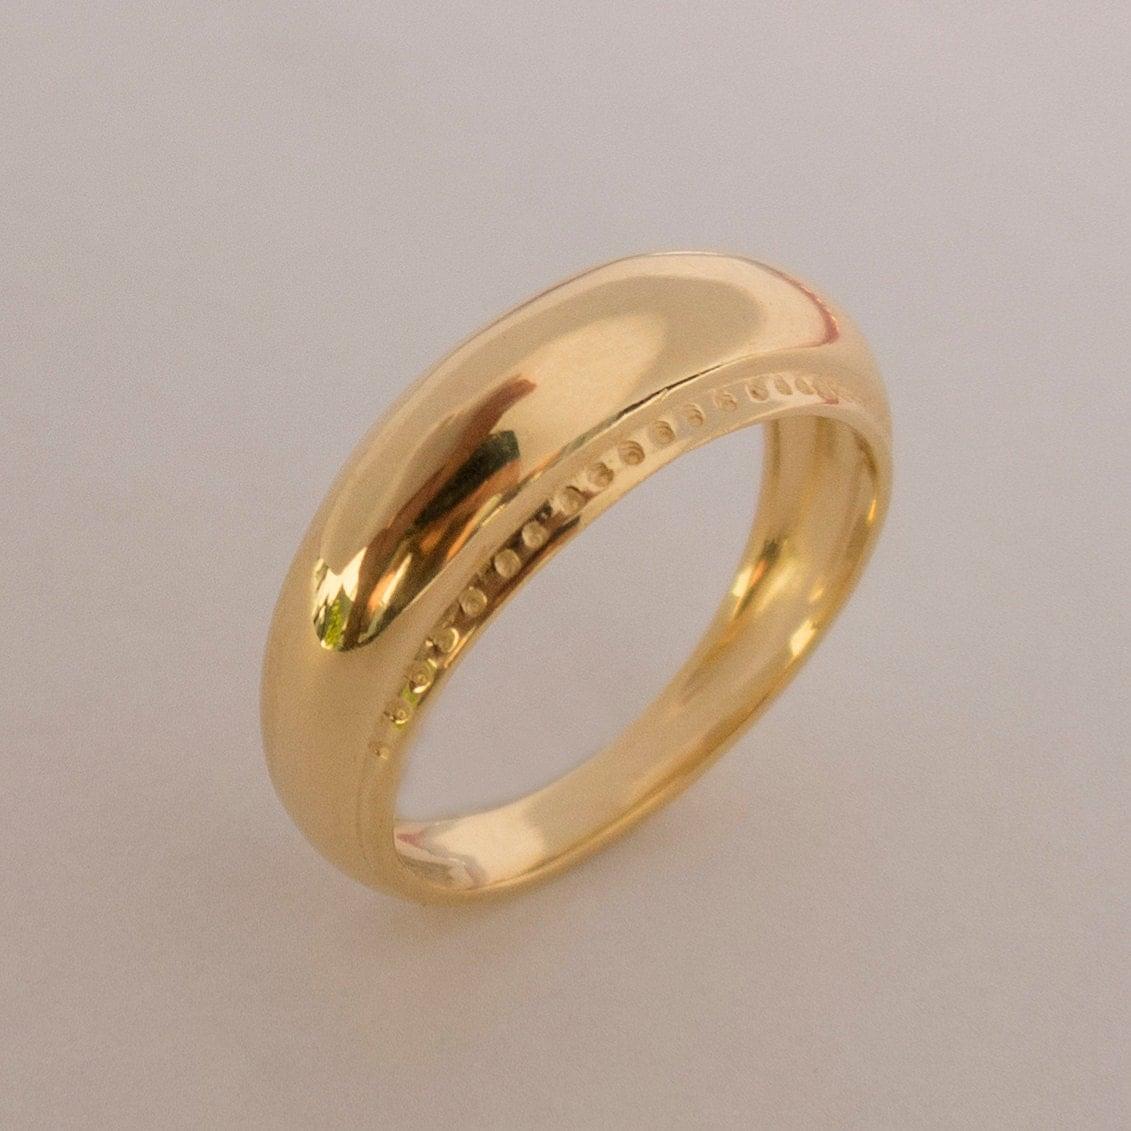 viking ring no 2 14k gold ring unisex ring wedding ring. Black Bedroom Furniture Sets. Home Design Ideas